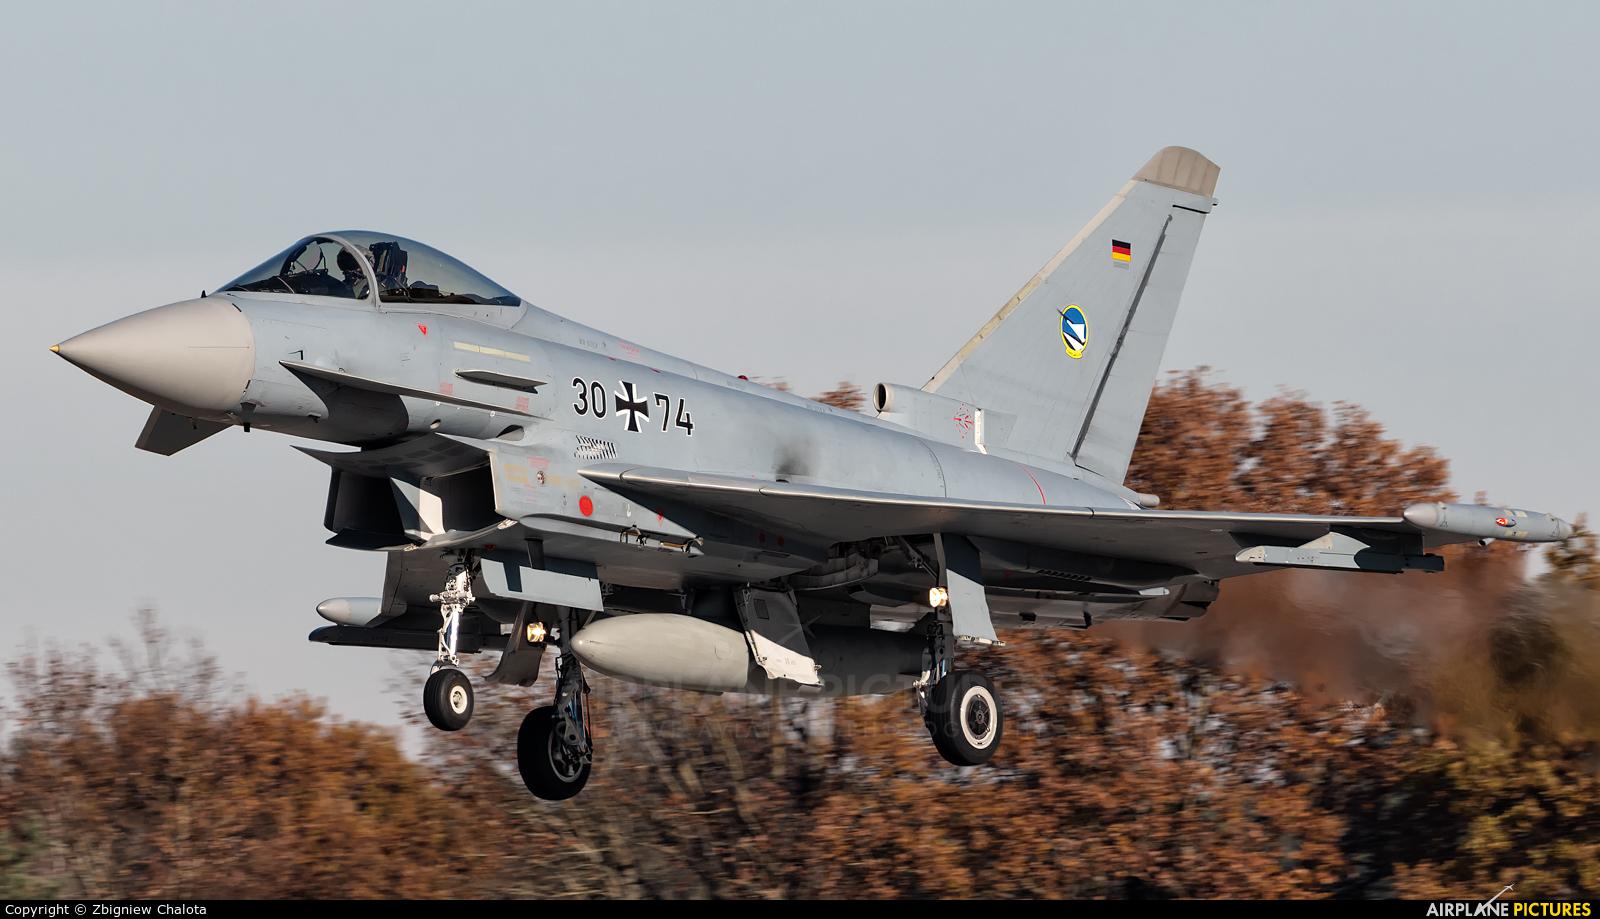 Germany - Air Force 30+74 aircraft at Ingolstadt - Manching